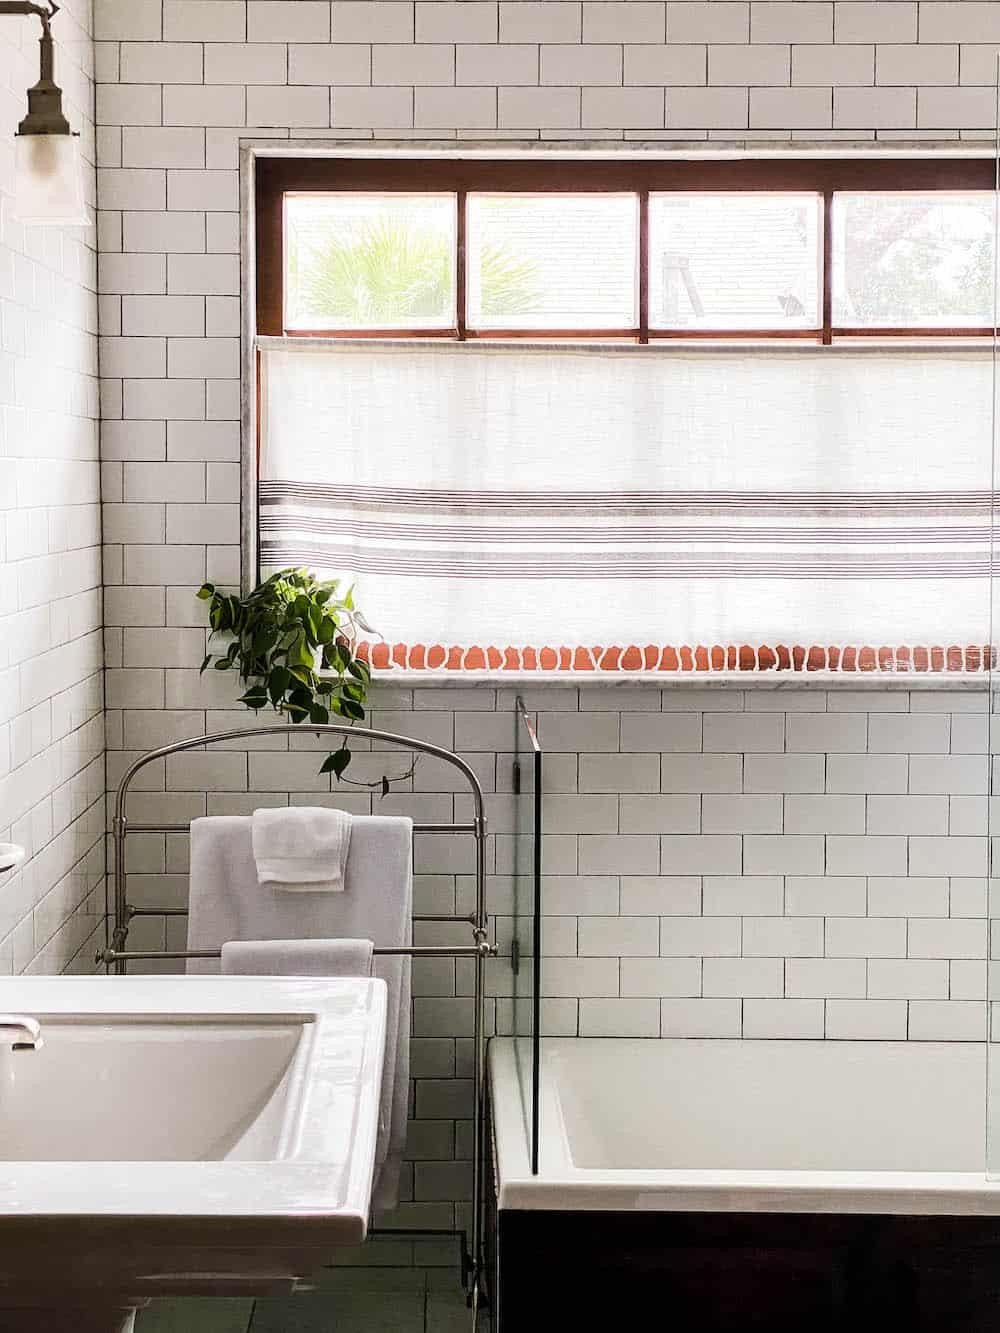 bathroom curtain for privacy